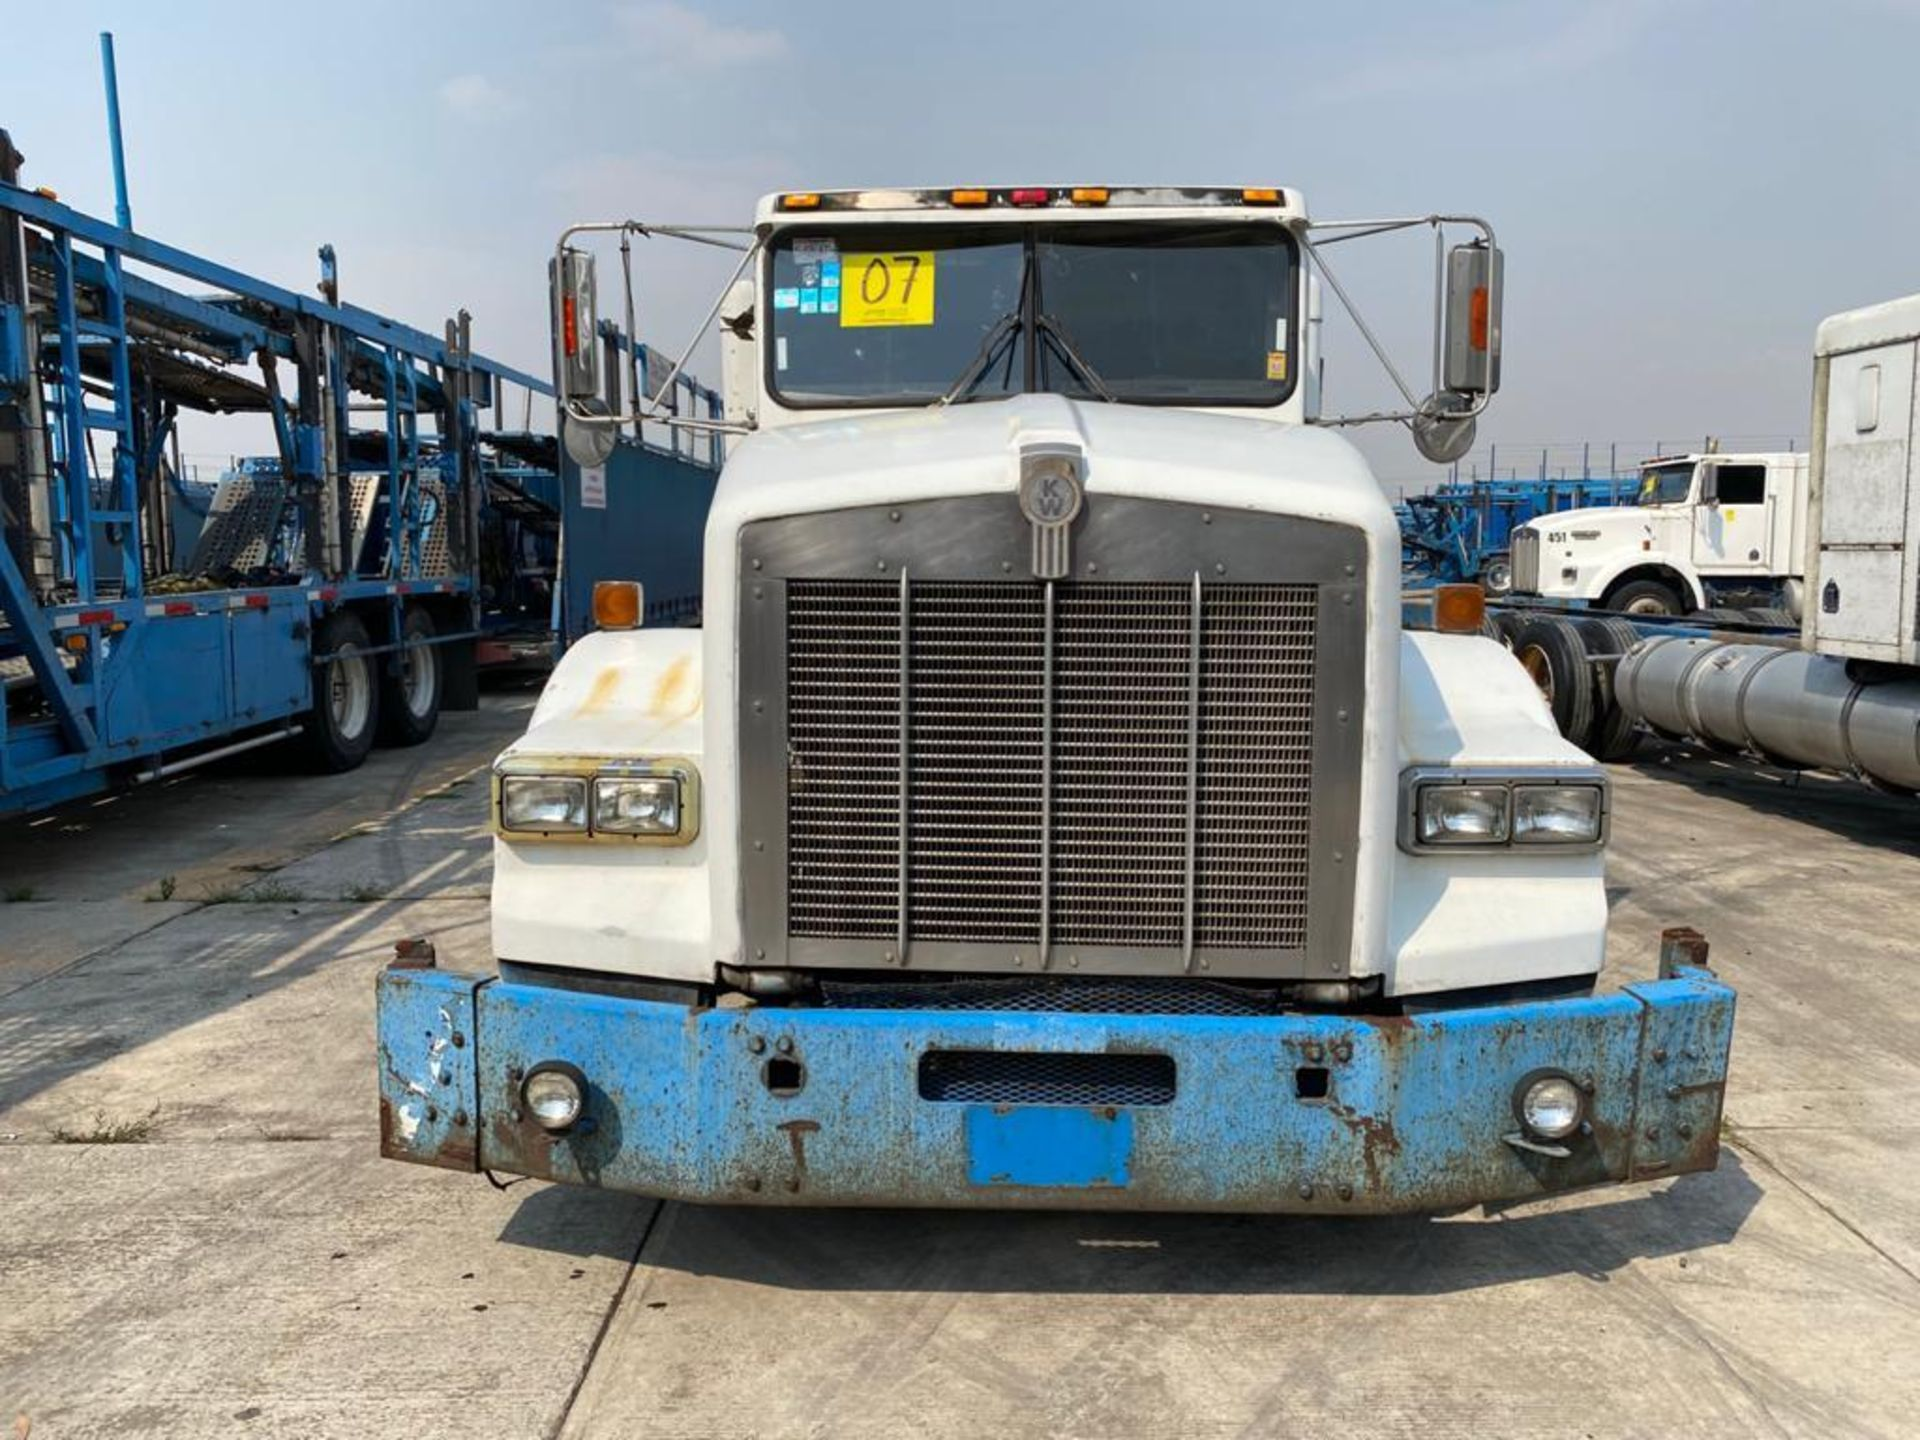 1999 Kenworth Sleeper truck tractor, standard transmission of 18 speeds - Image 4 of 72